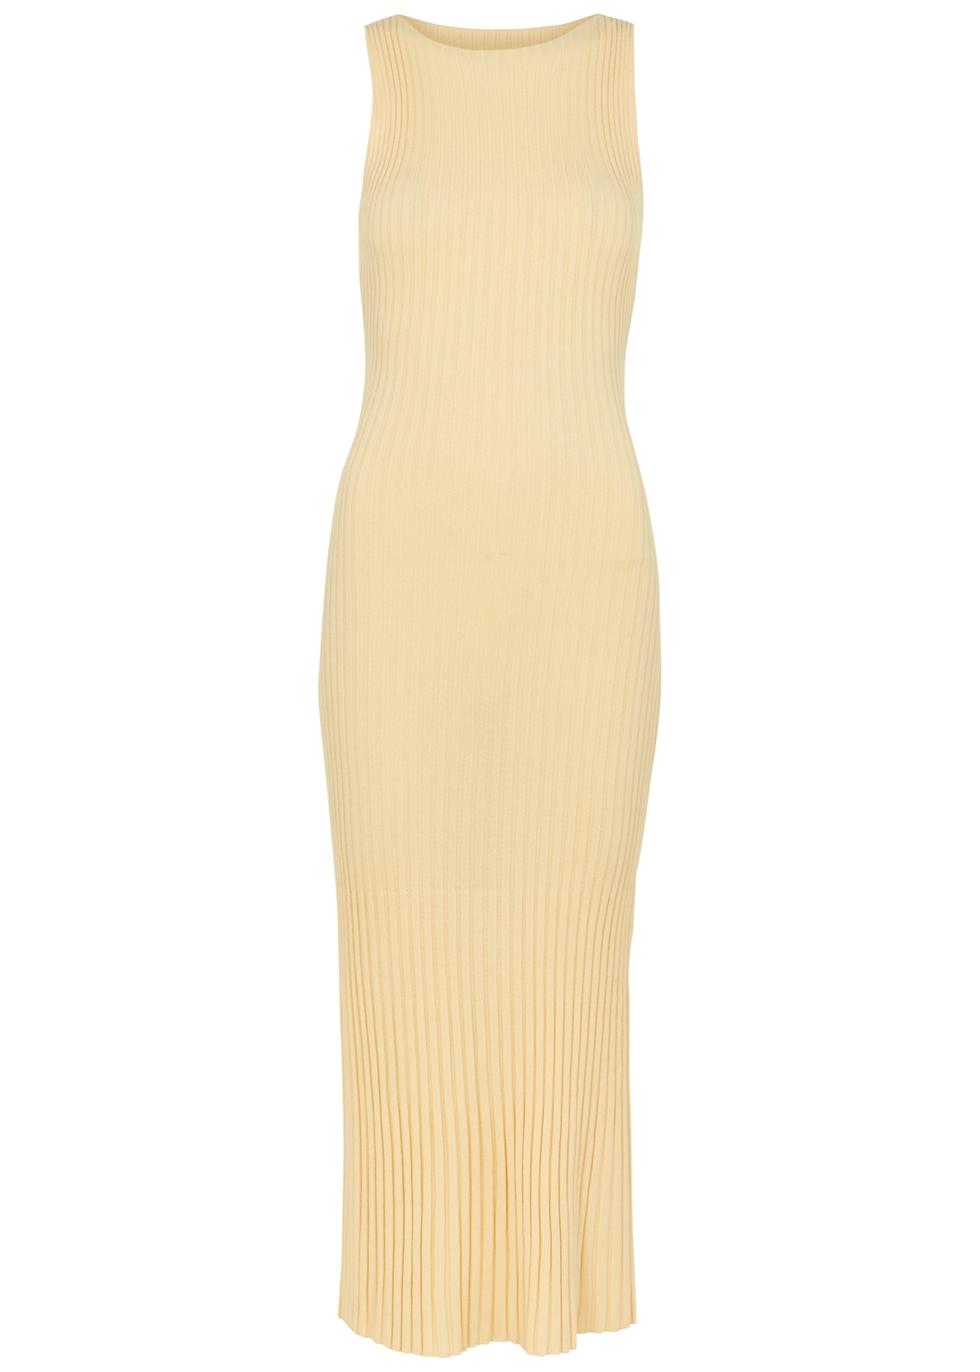 Lyla cream ribbed midi dress